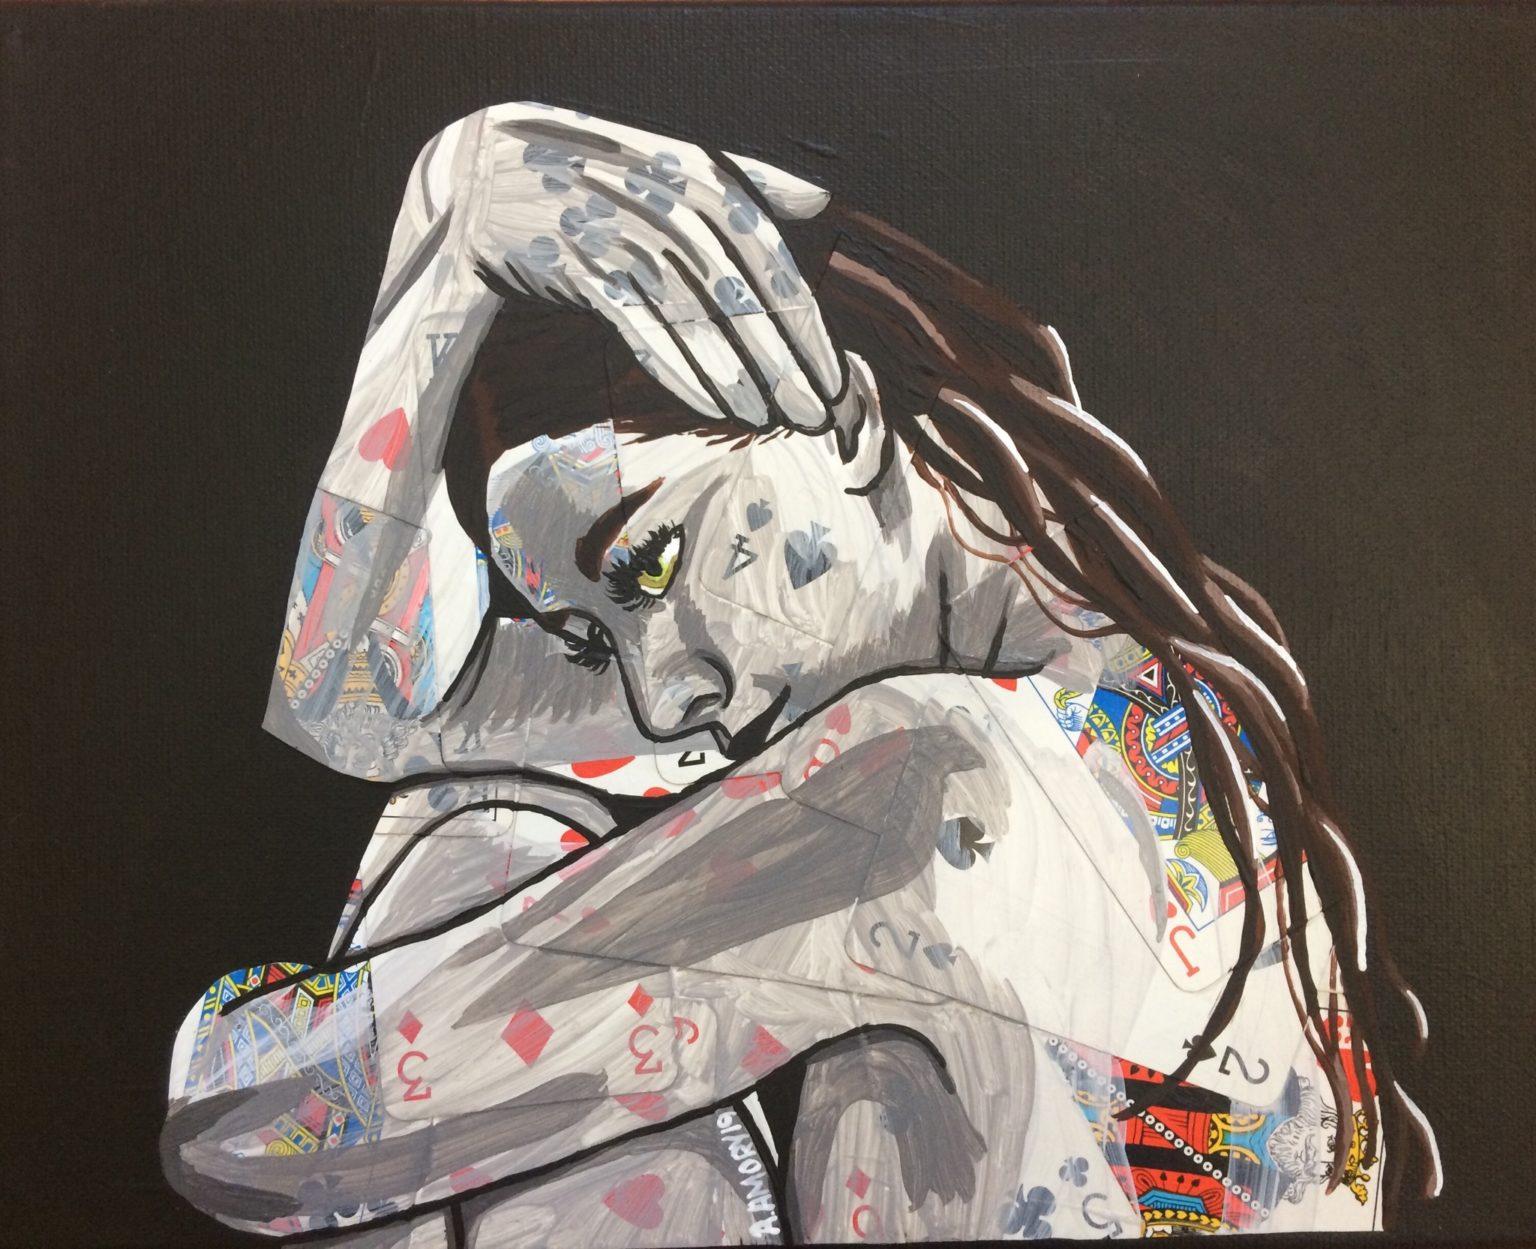 Annabelle I (Vendue) 25 x 30 cm - 2019